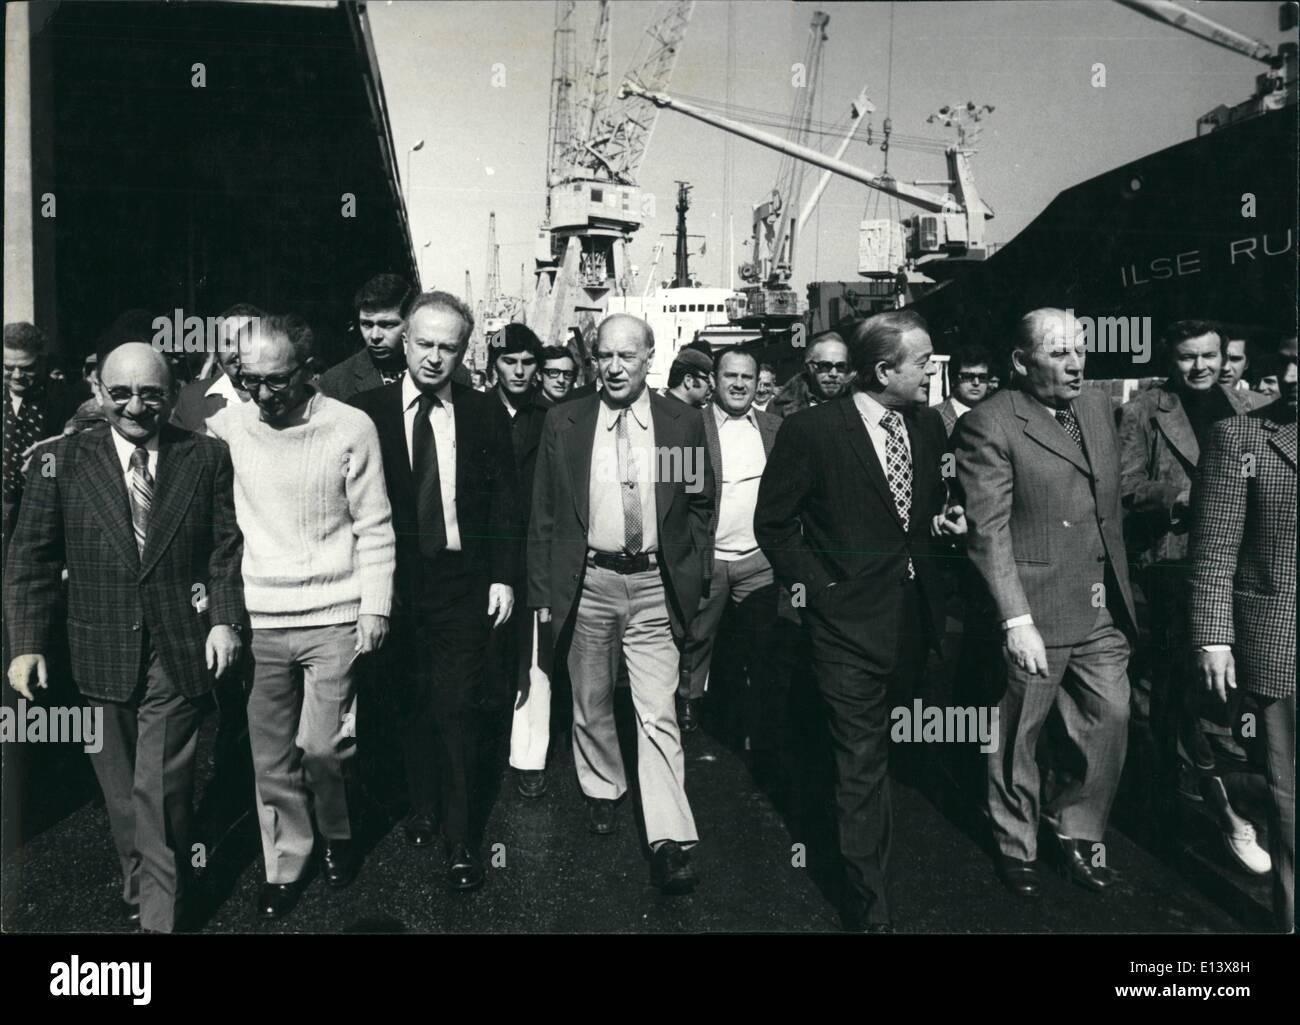 Marzo 27, 2012 - Premiere Ytzak Rabin Imagen De Stock